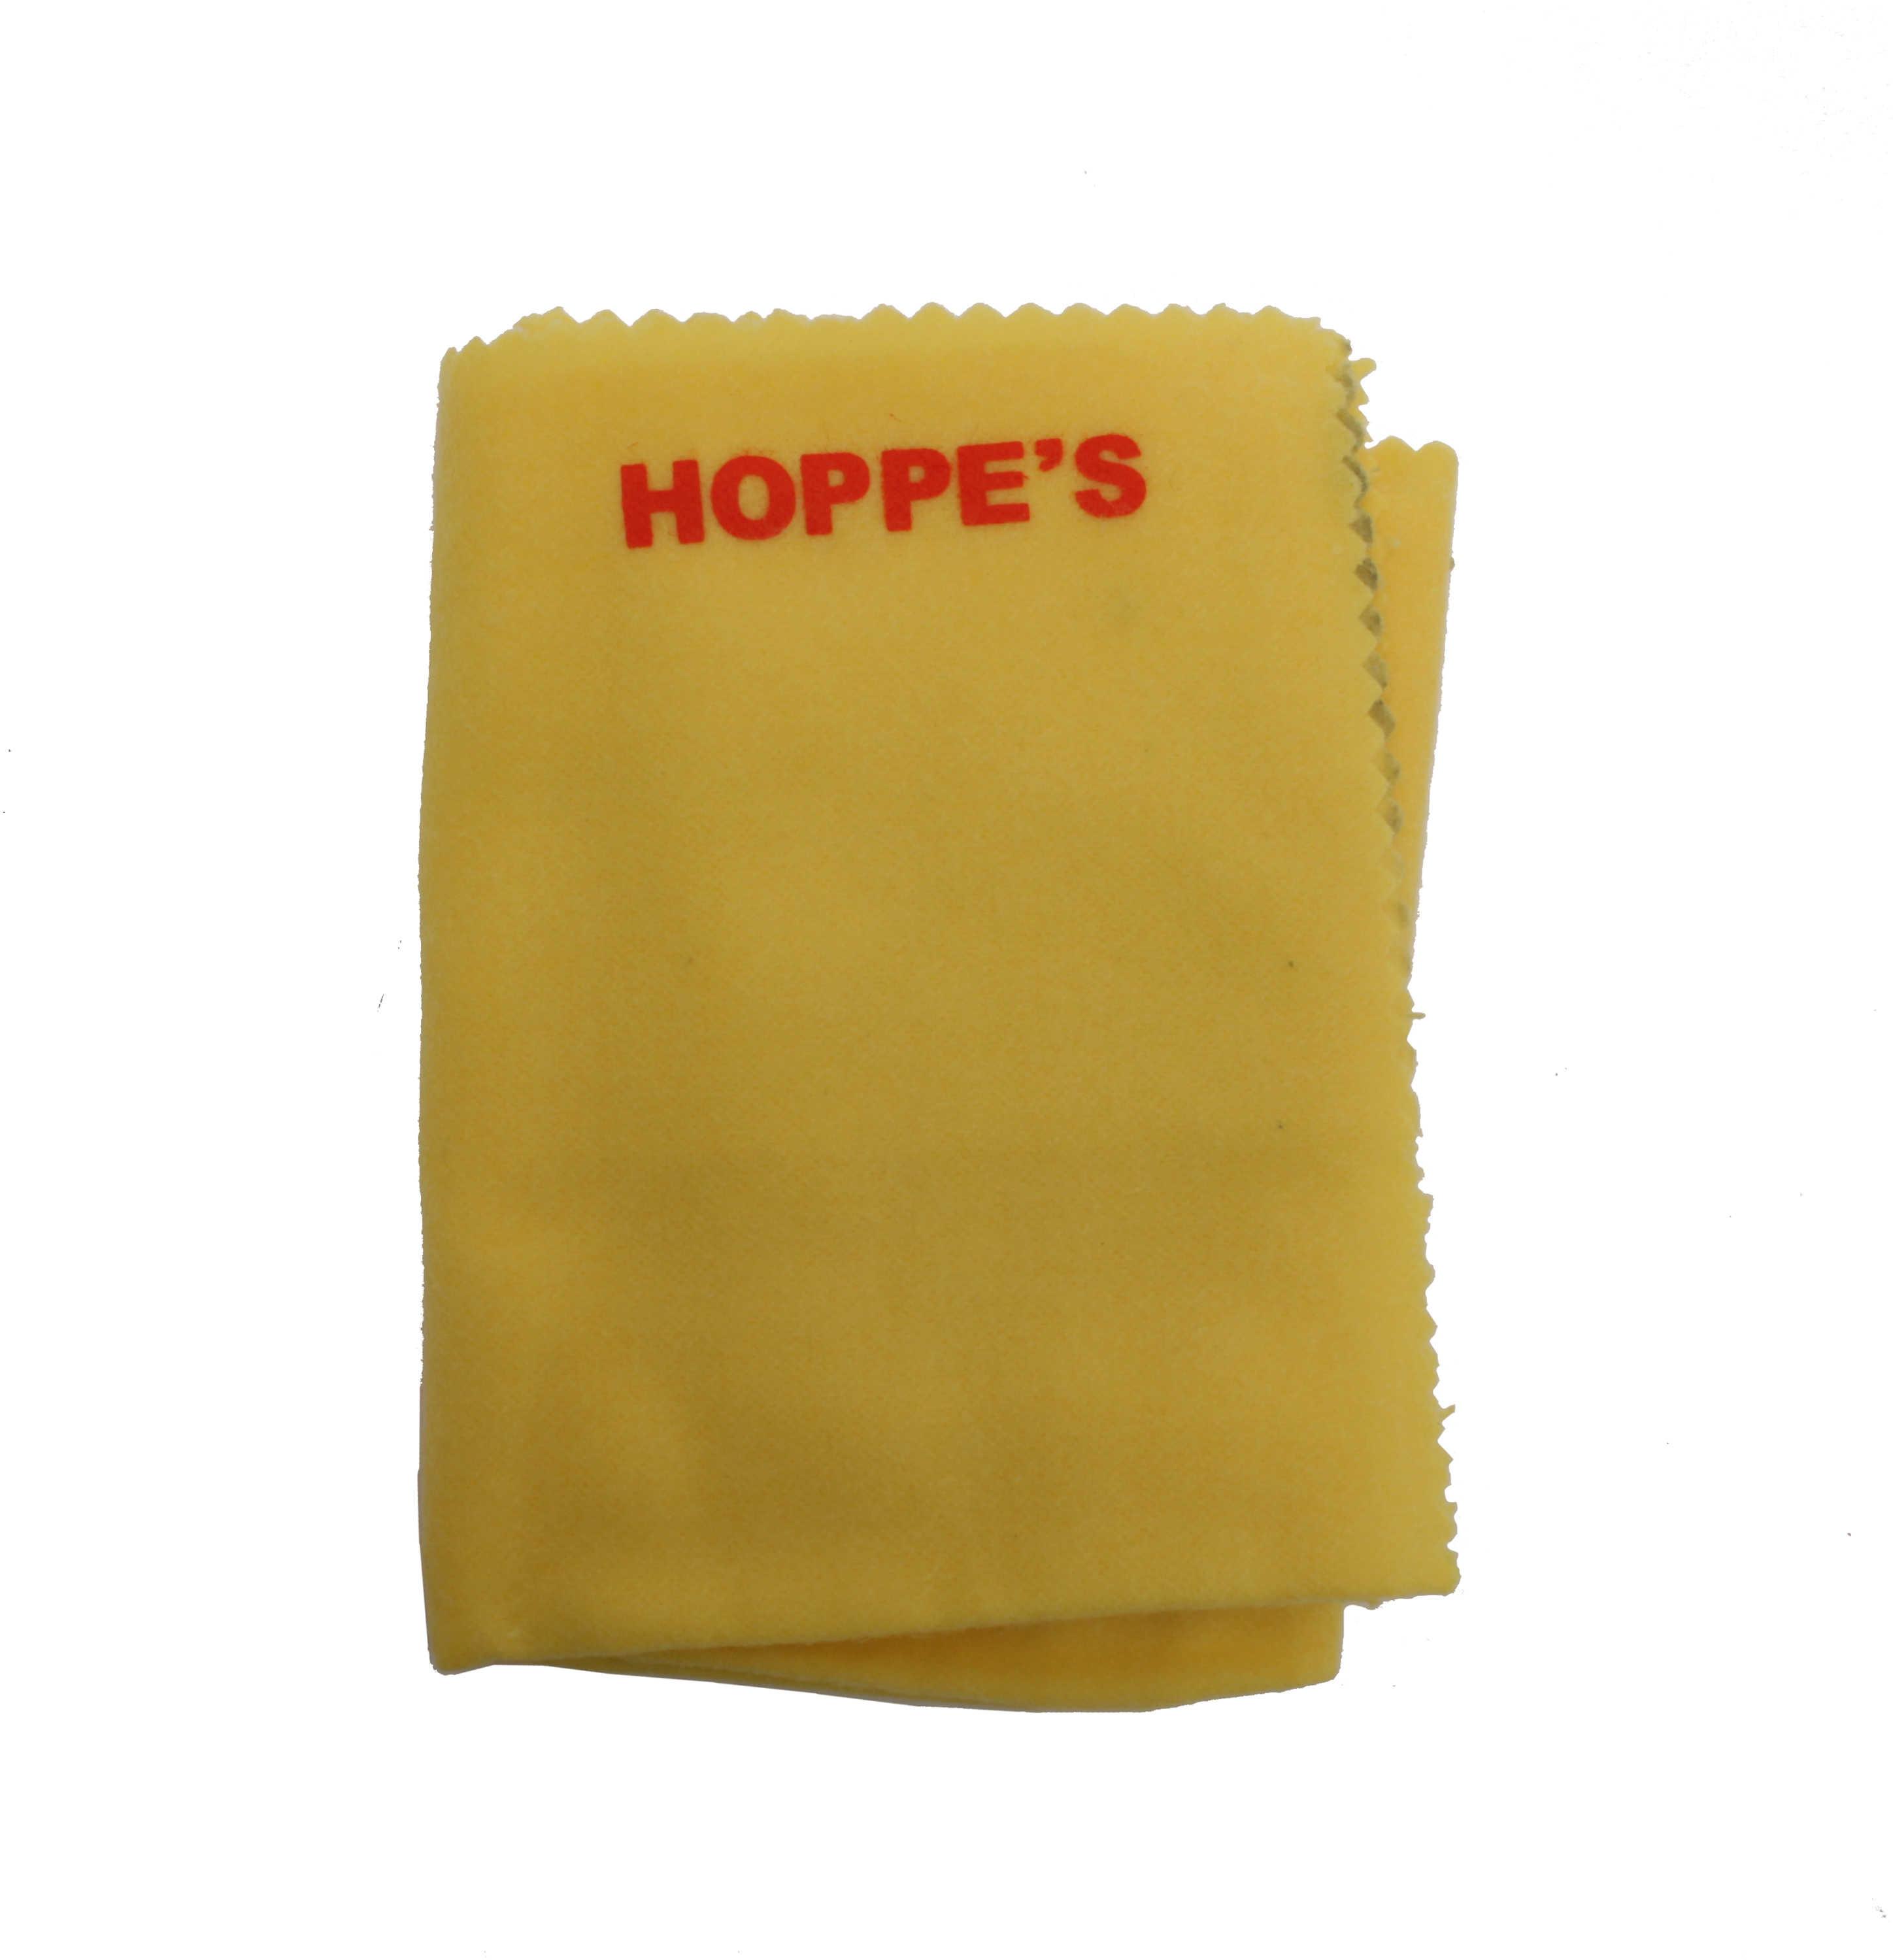 Hoppes Wax Treated Cloth For Wood Stocks 1217